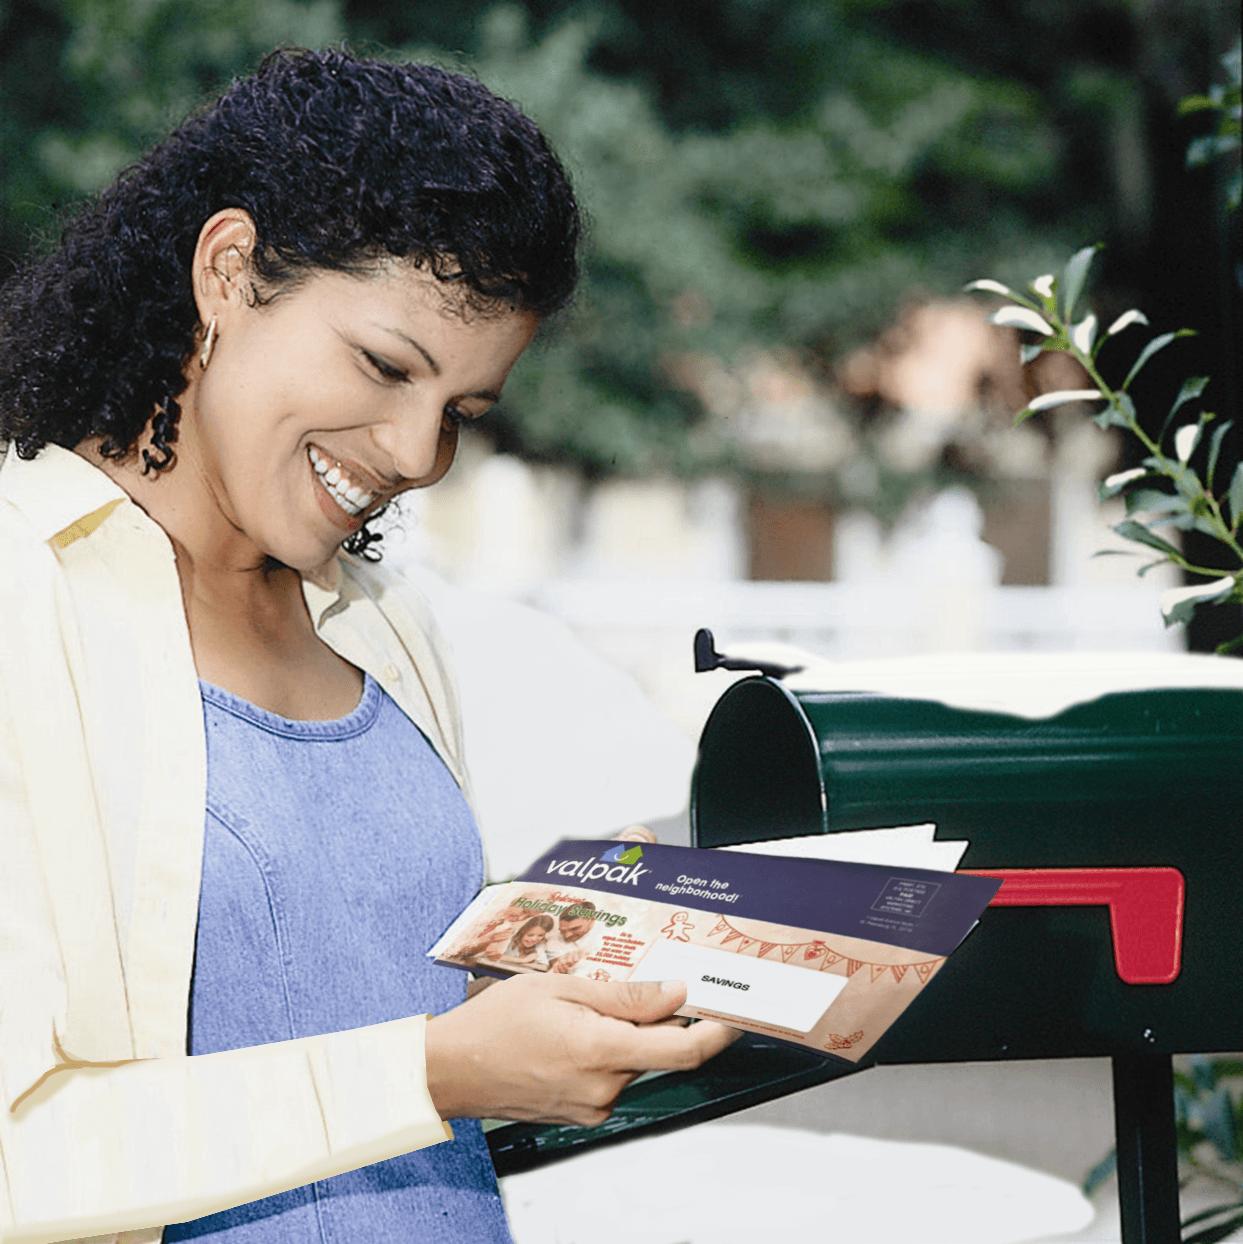 Valpak direct mail service